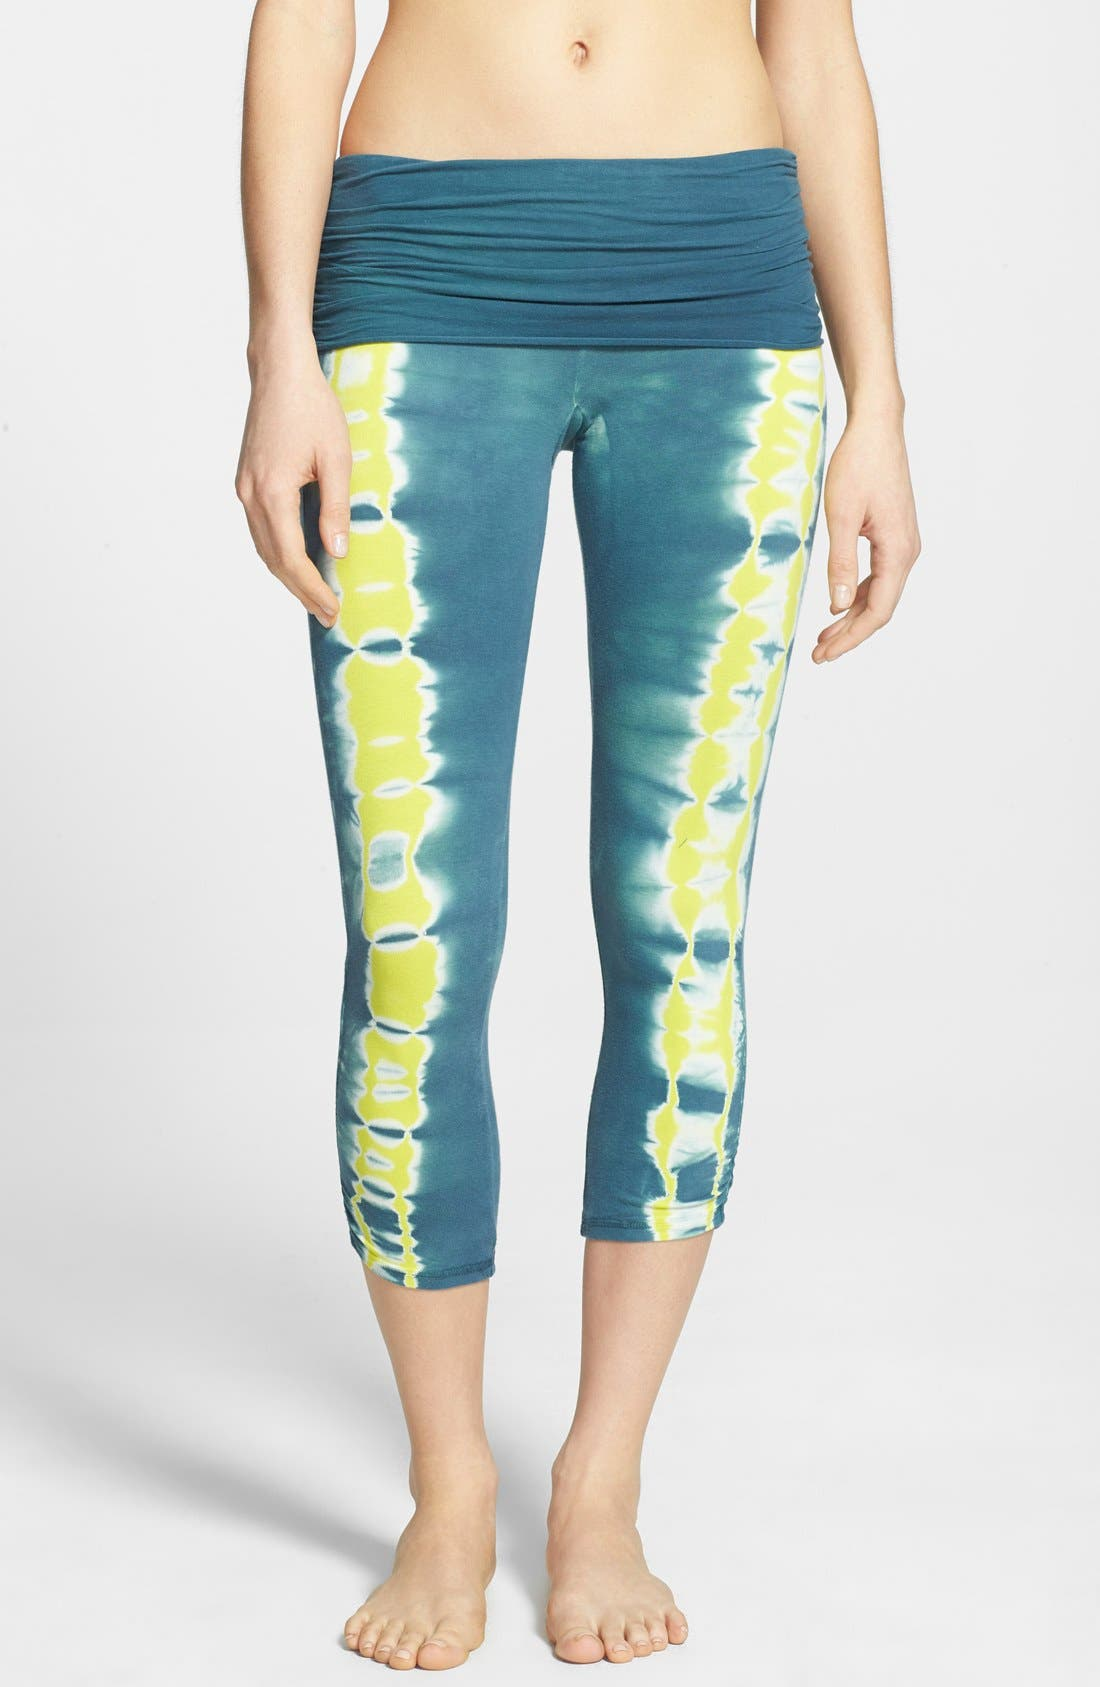 Alternate Image 1 Selected - Omgirl 'Free Stripe Ahimsa' Organic Cotton Capri Leggings